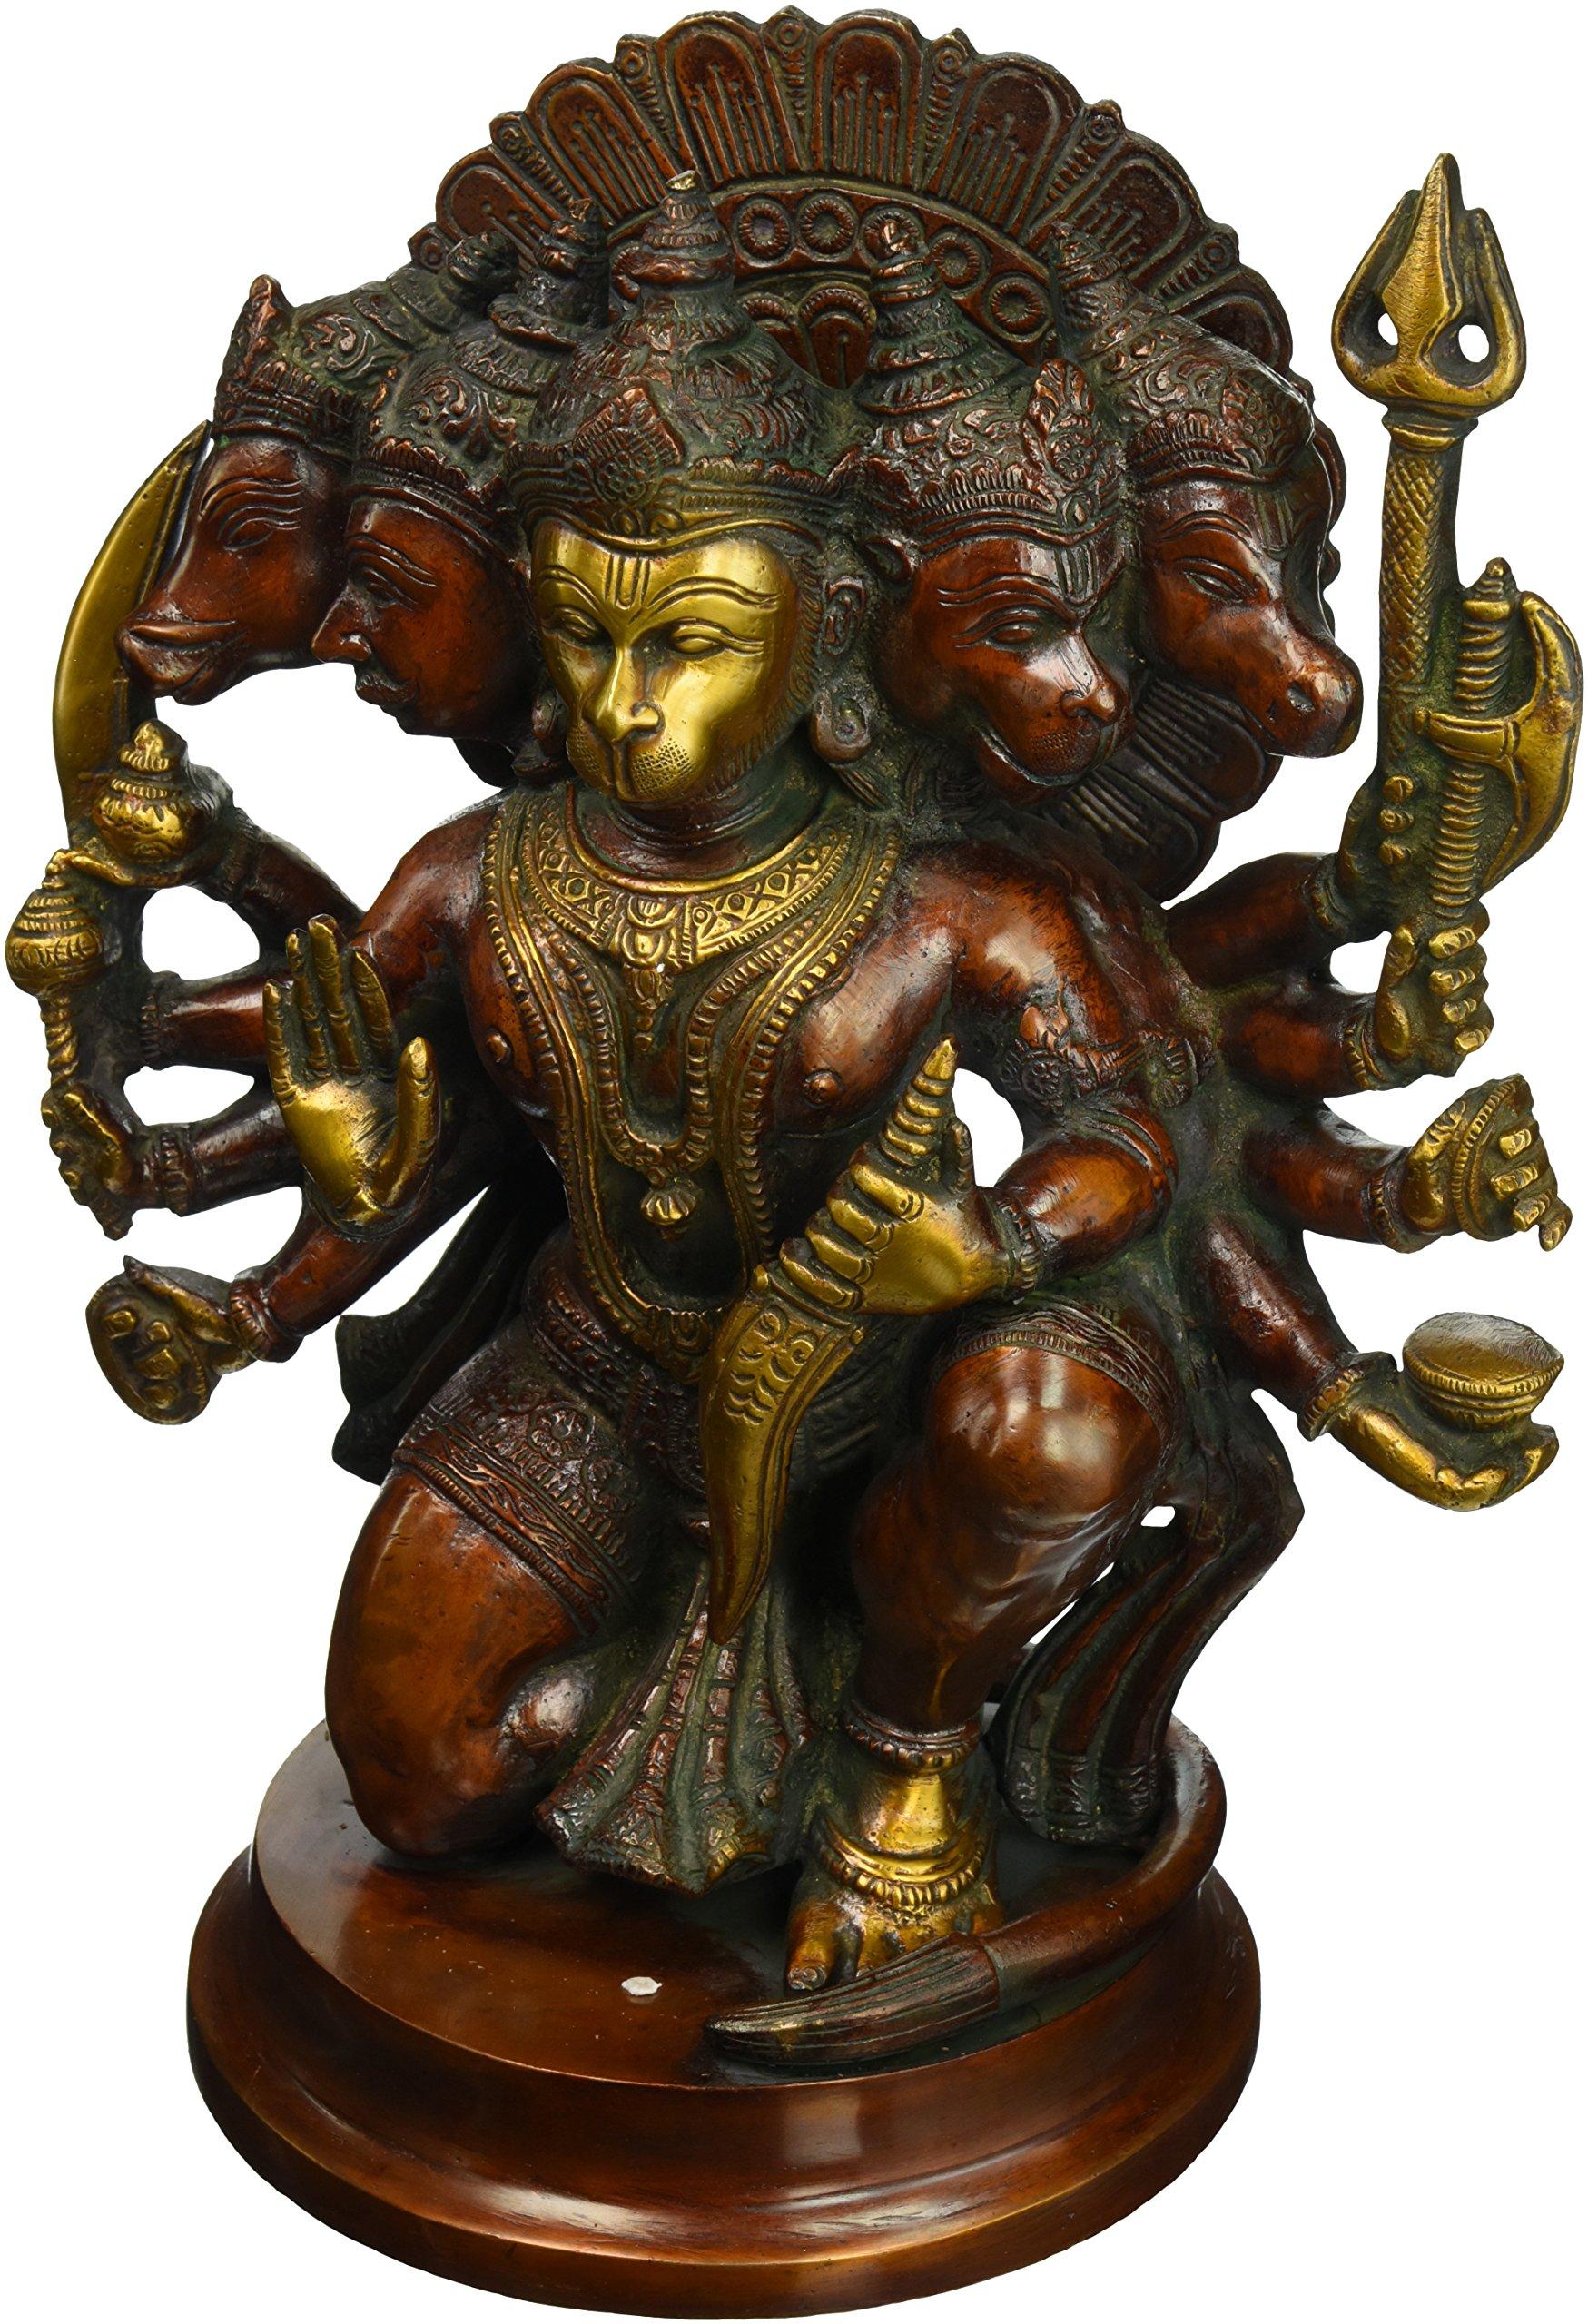 Aone India 11'' Unique Five Face Hanuman Statue - Big Hindu God Brass Monkey Lord Idol Sculpture Figurine - Strength Figure - Bajrang Bali Religious Deity + Cash Envelope (Pack Of 10)